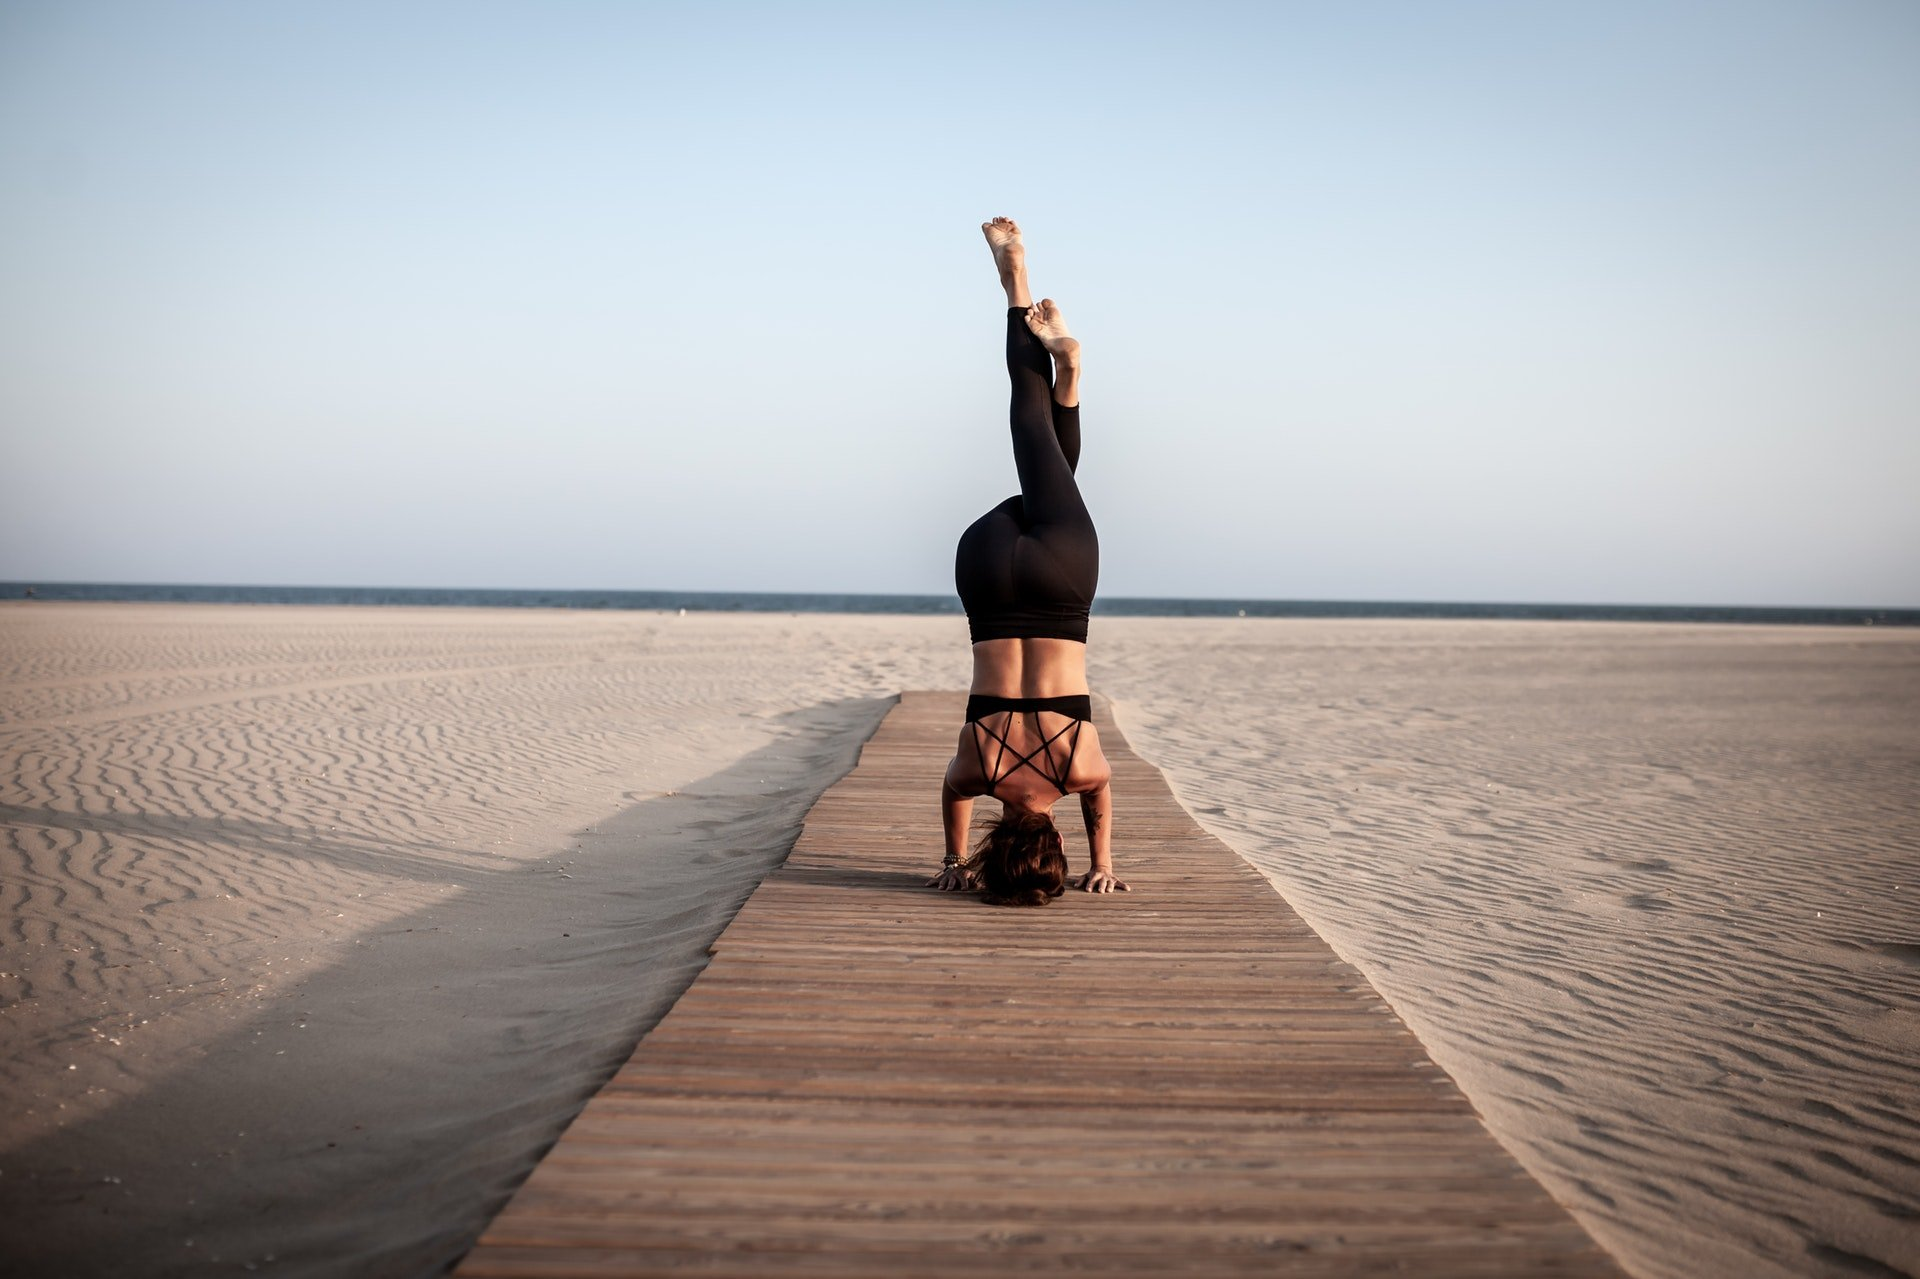 balance beach dawn 2417474 1